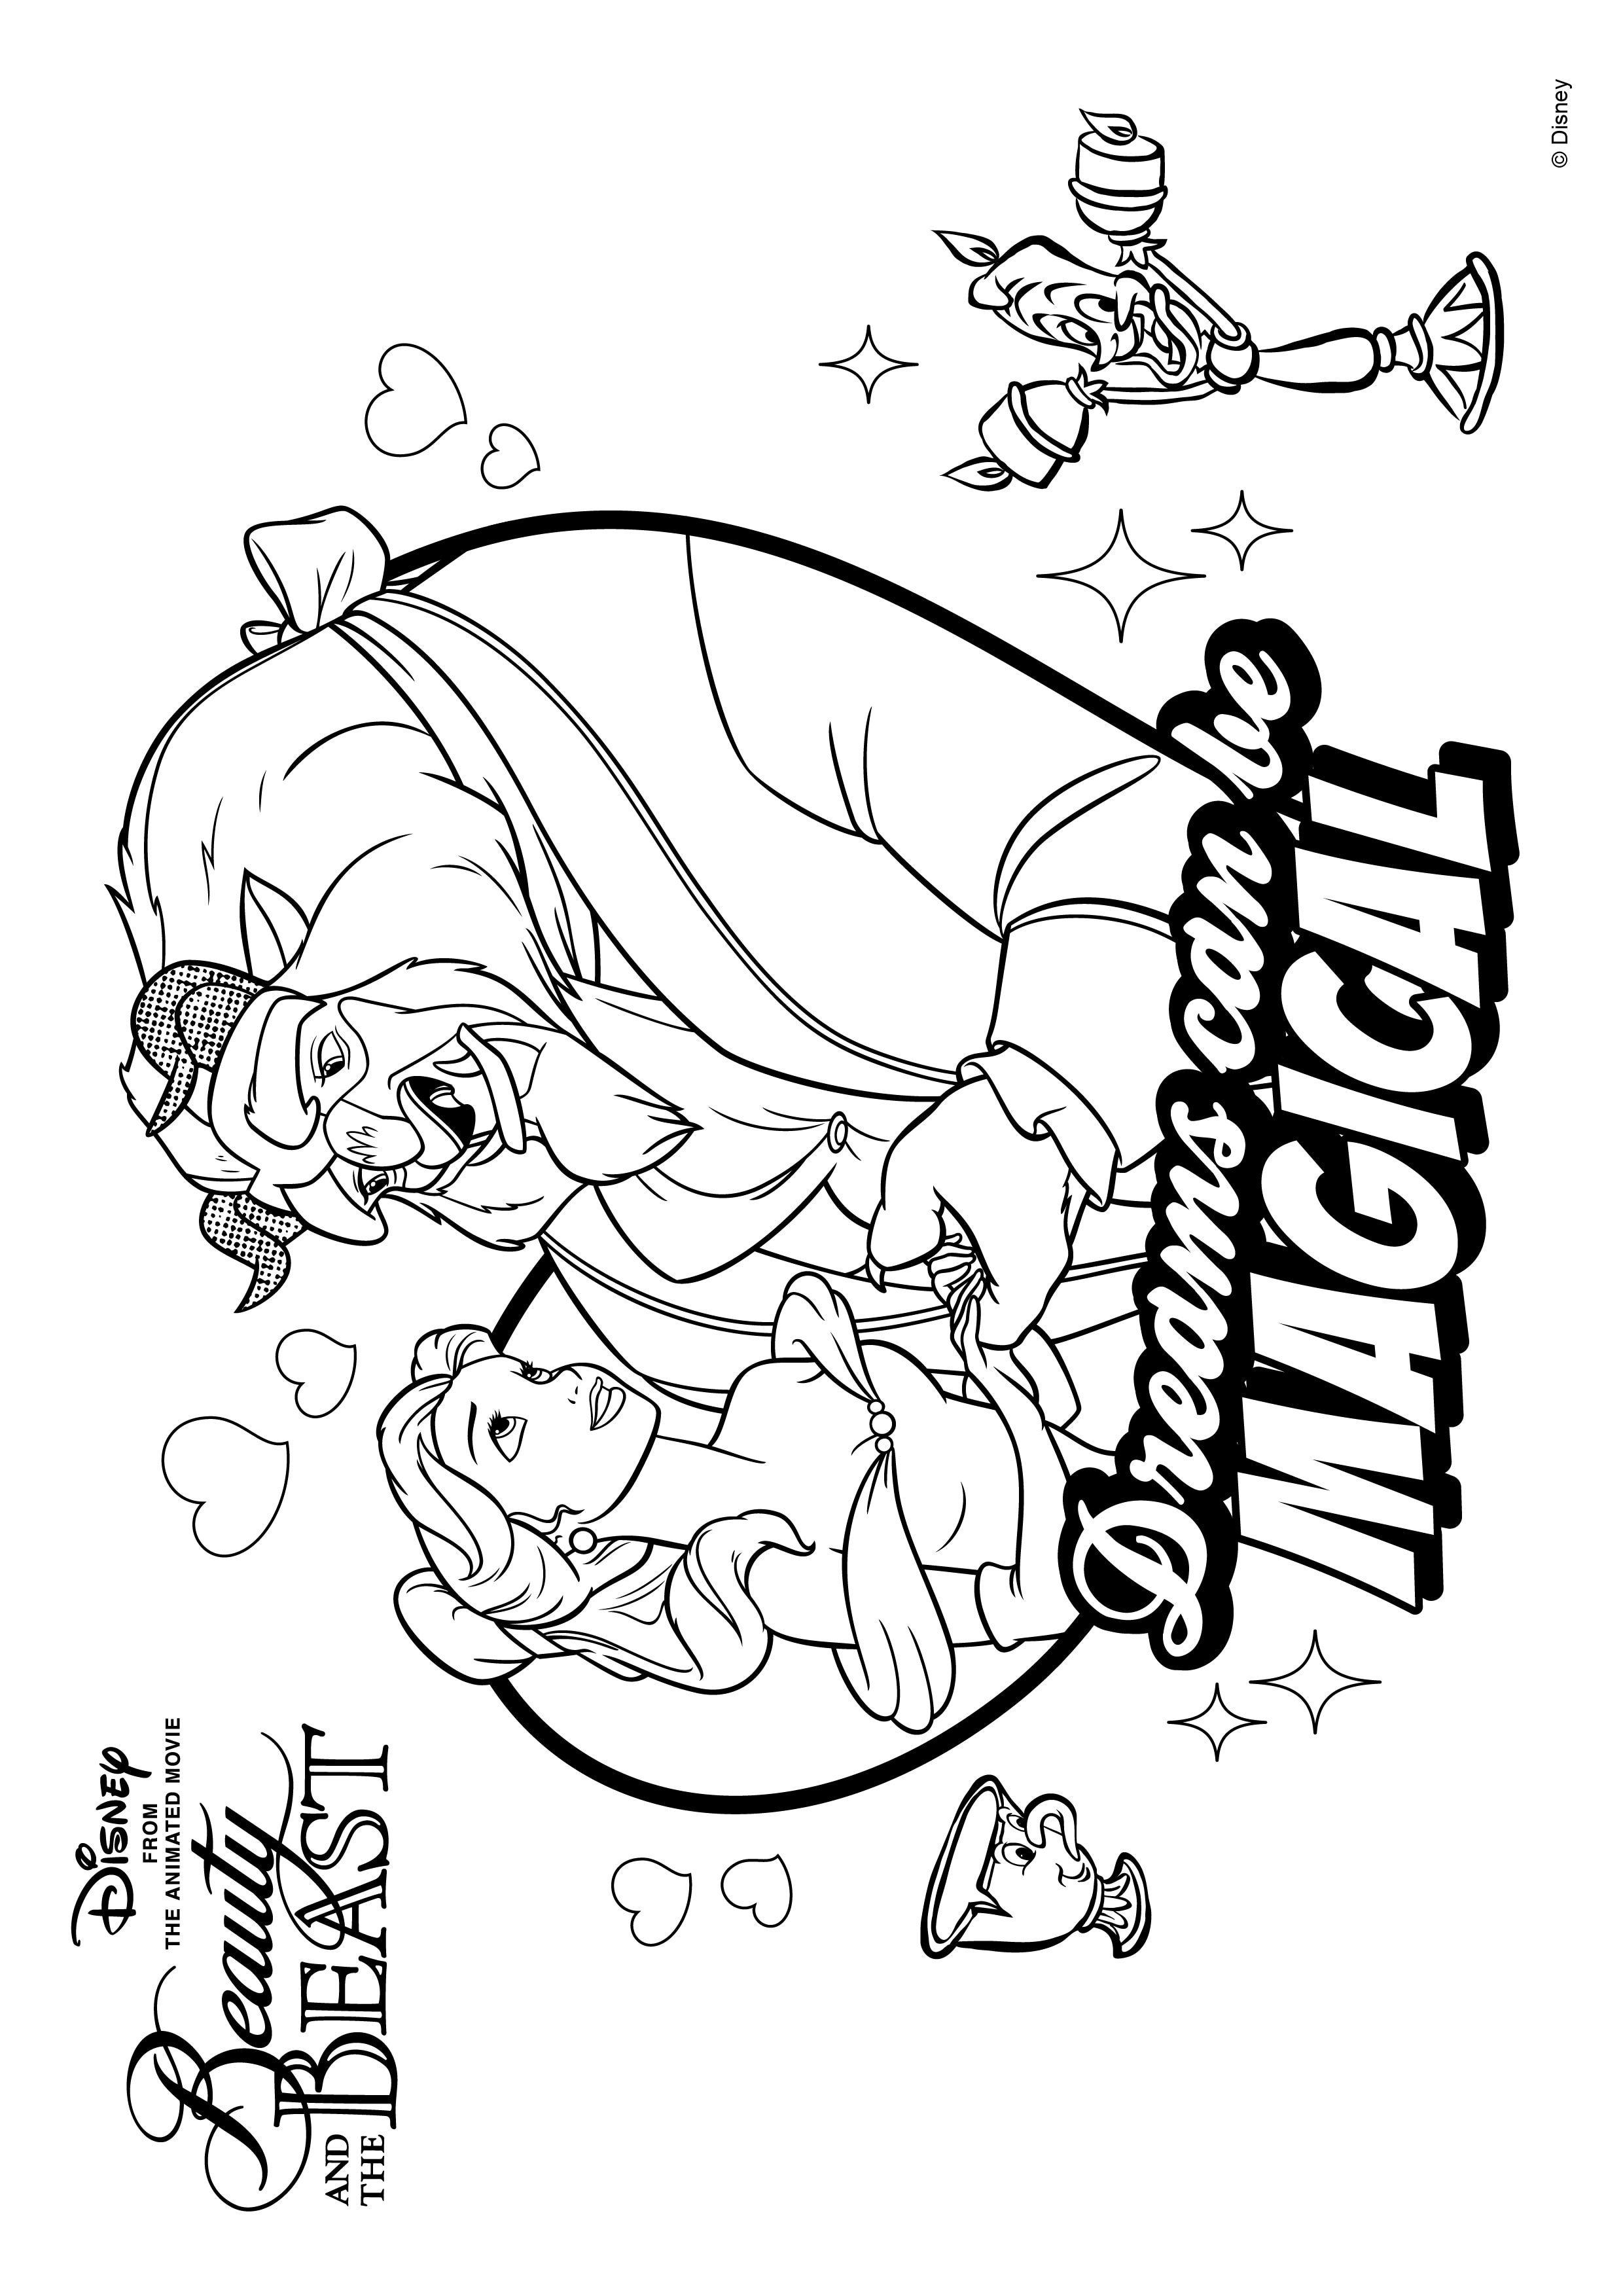 download image 04 | ColorParty (Dec)